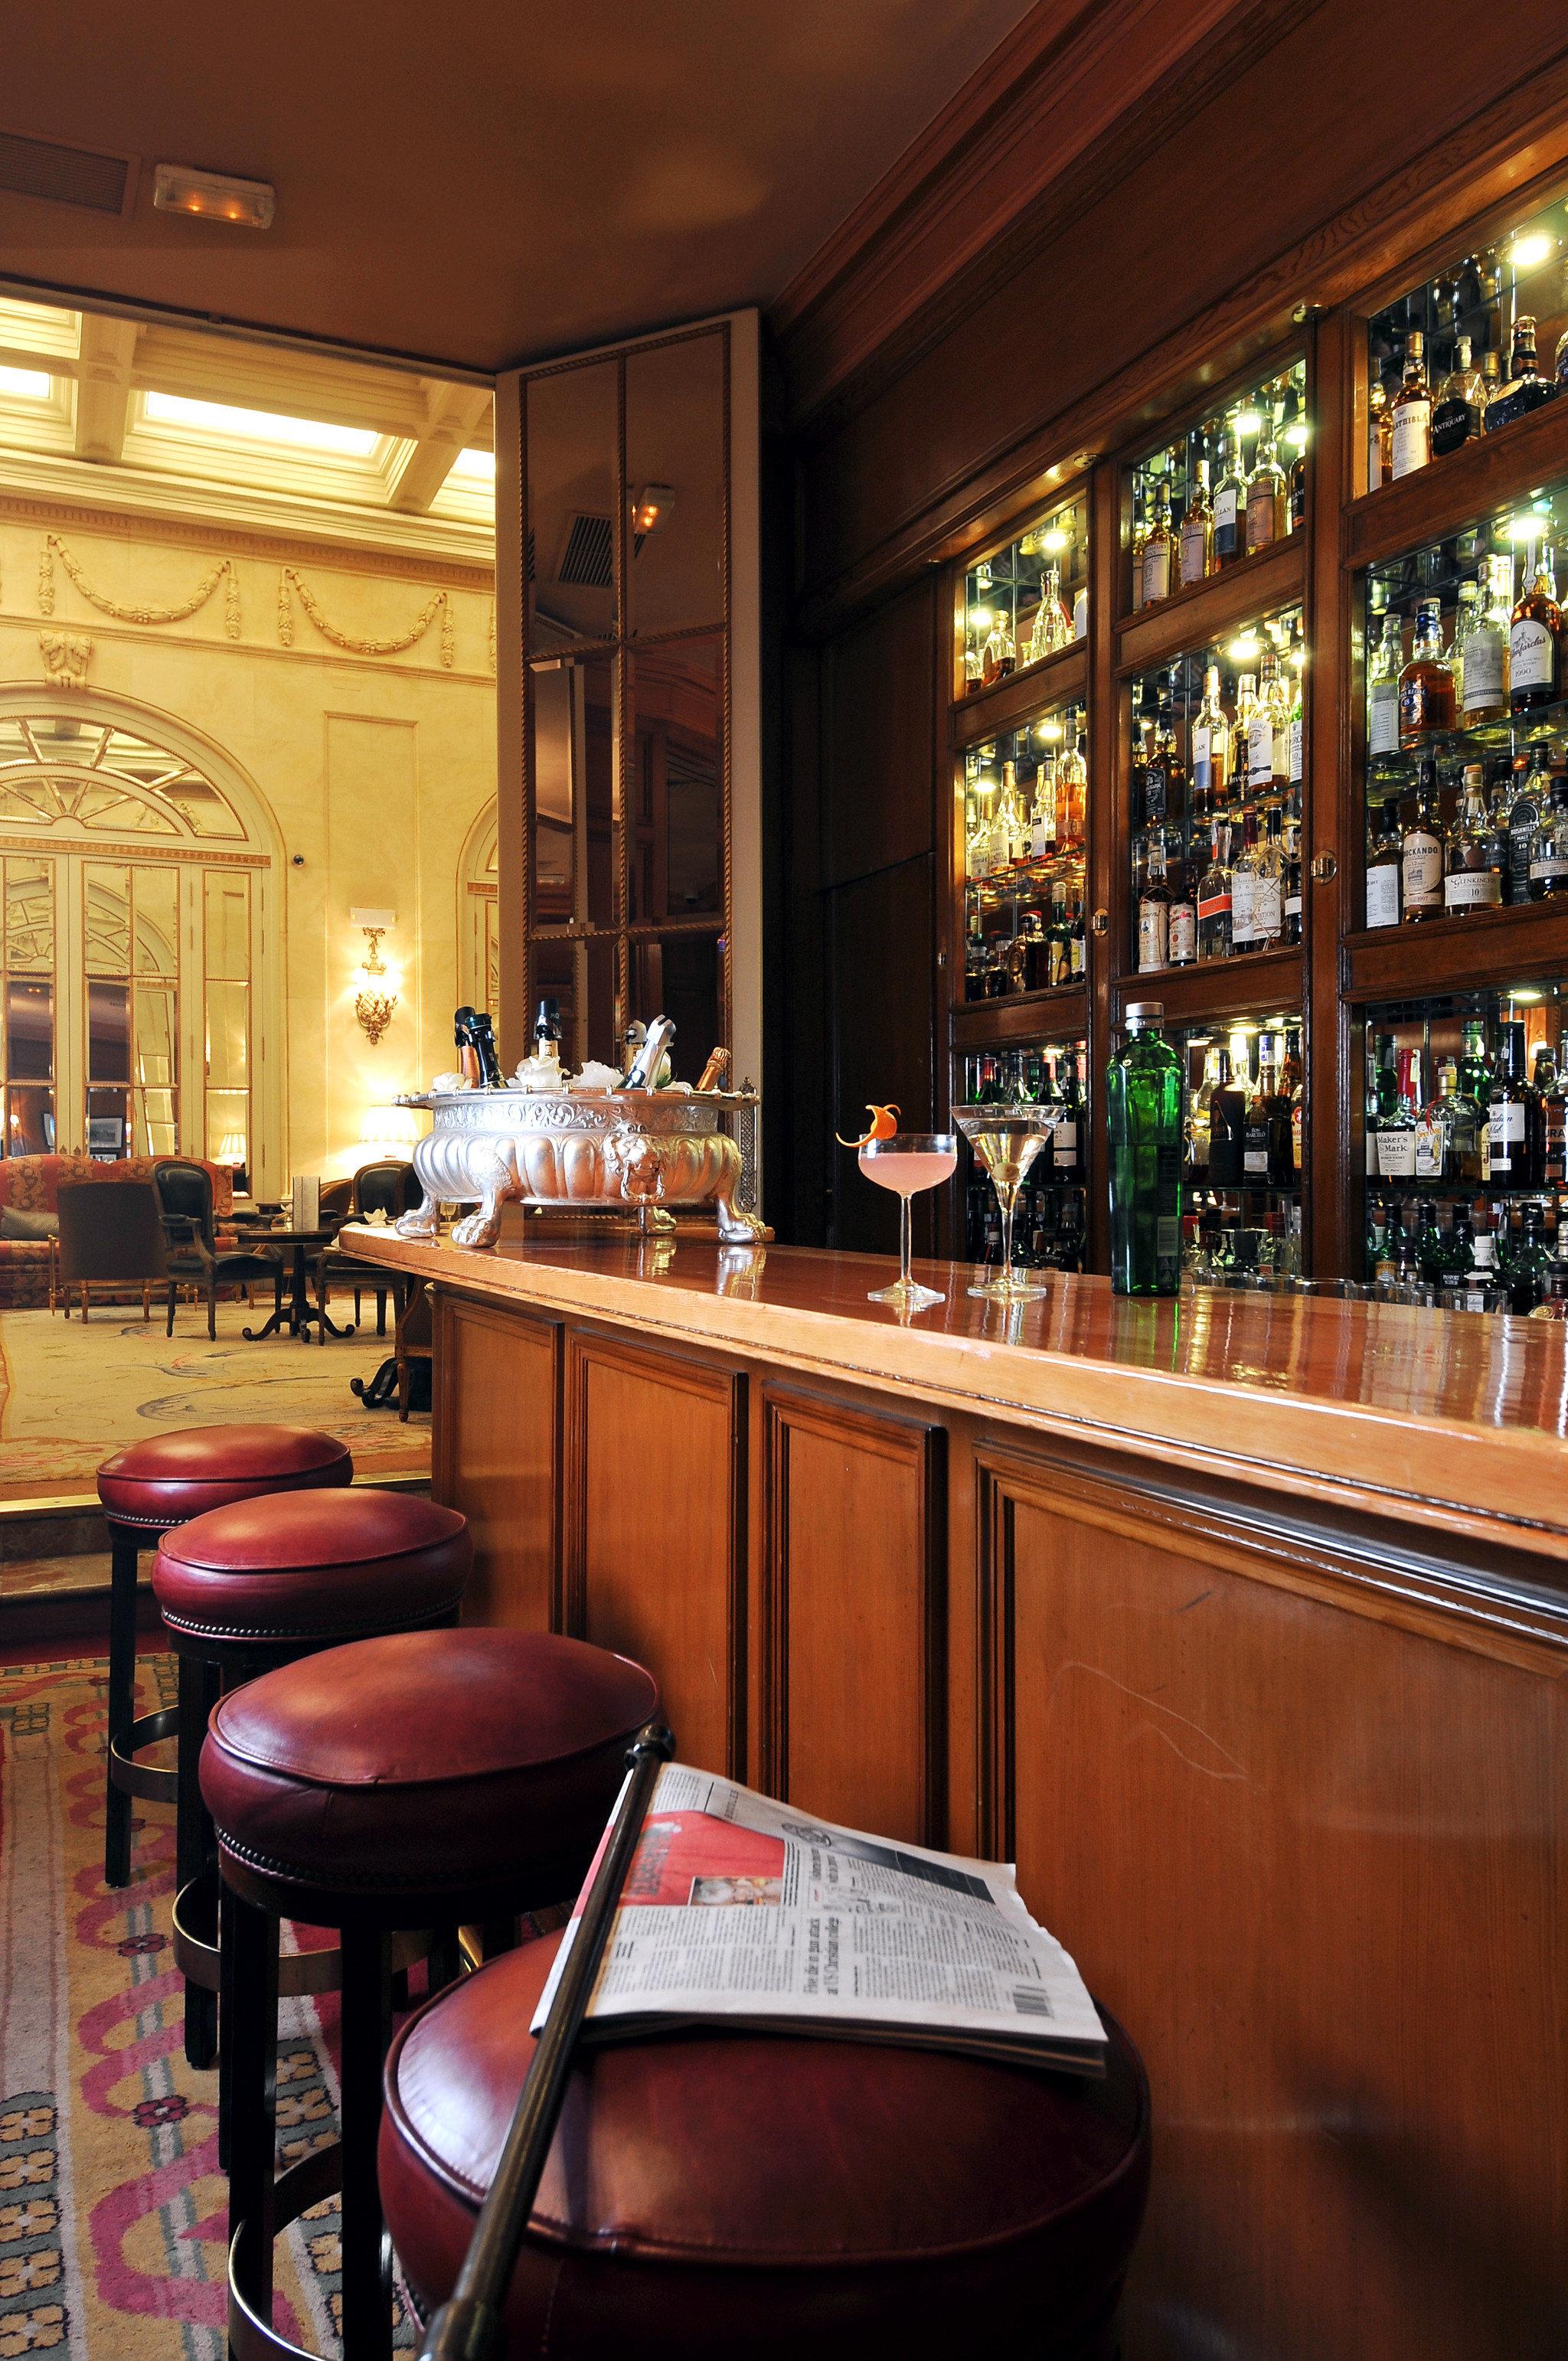 Bar Dining Drink Eat Elegant Historic Hotels Madrid Spain restaurant café coffeehouse